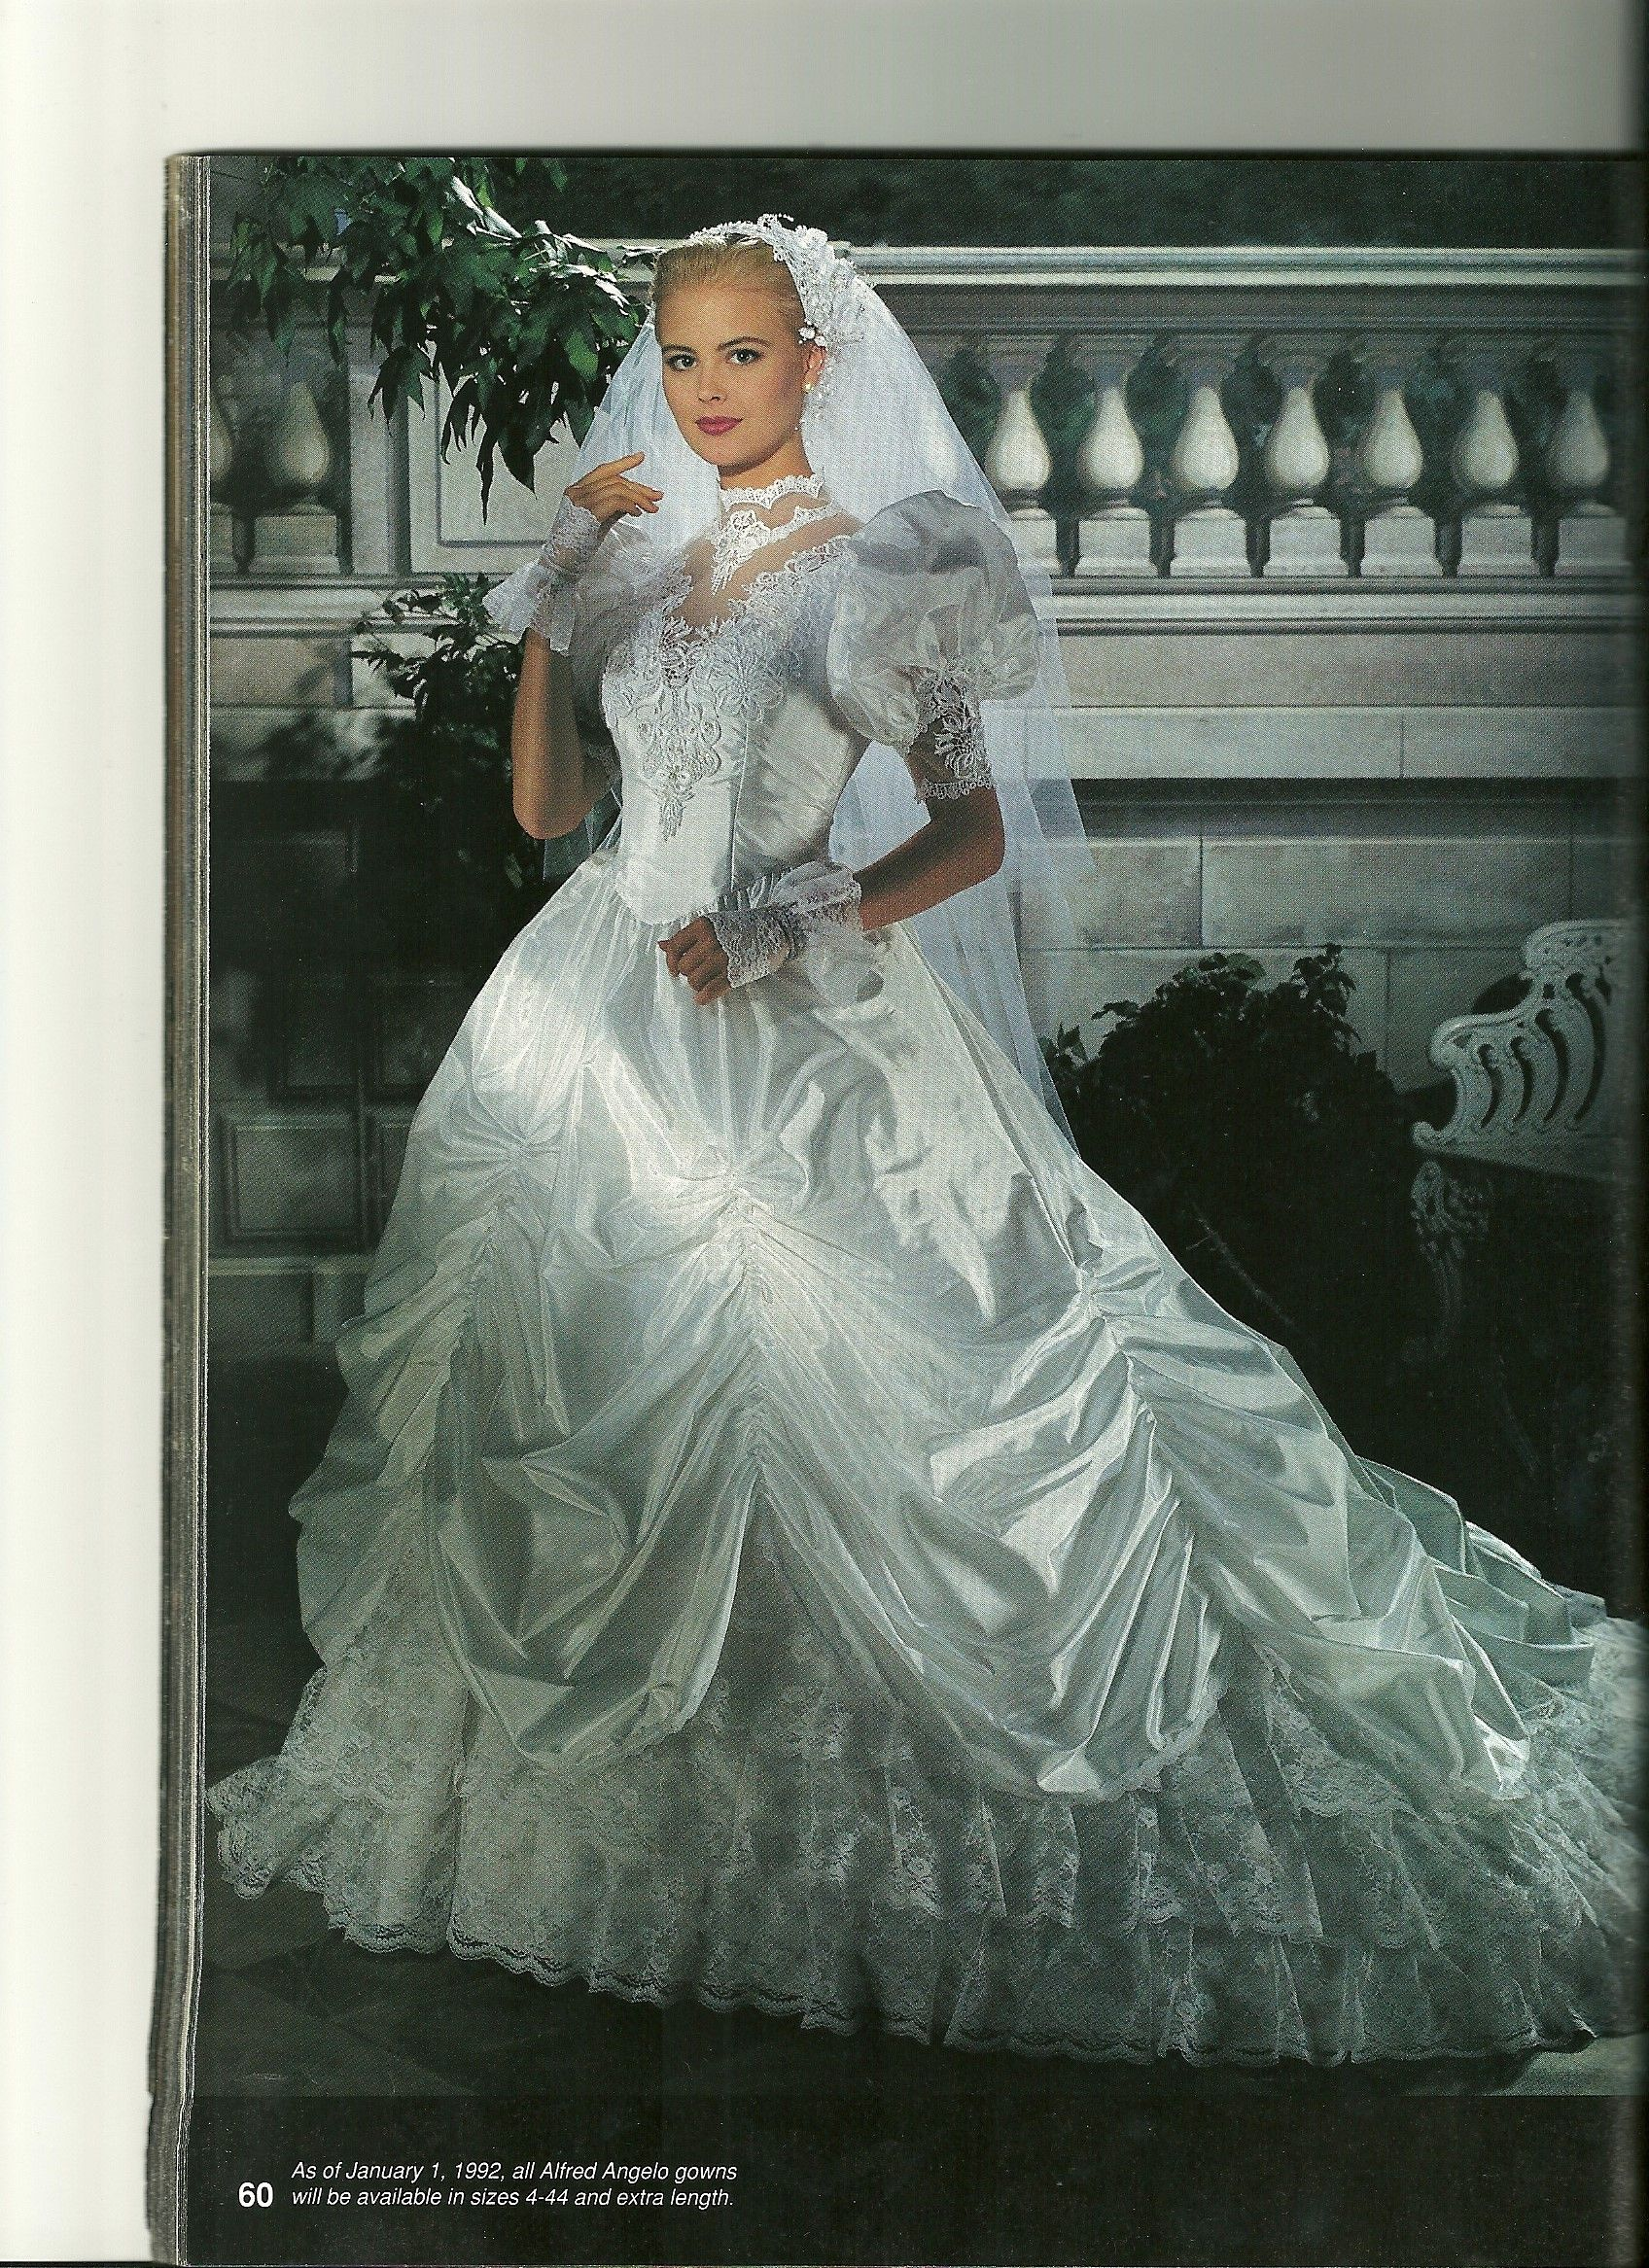 alfred angelo wedding dresses s s pinterest wedding